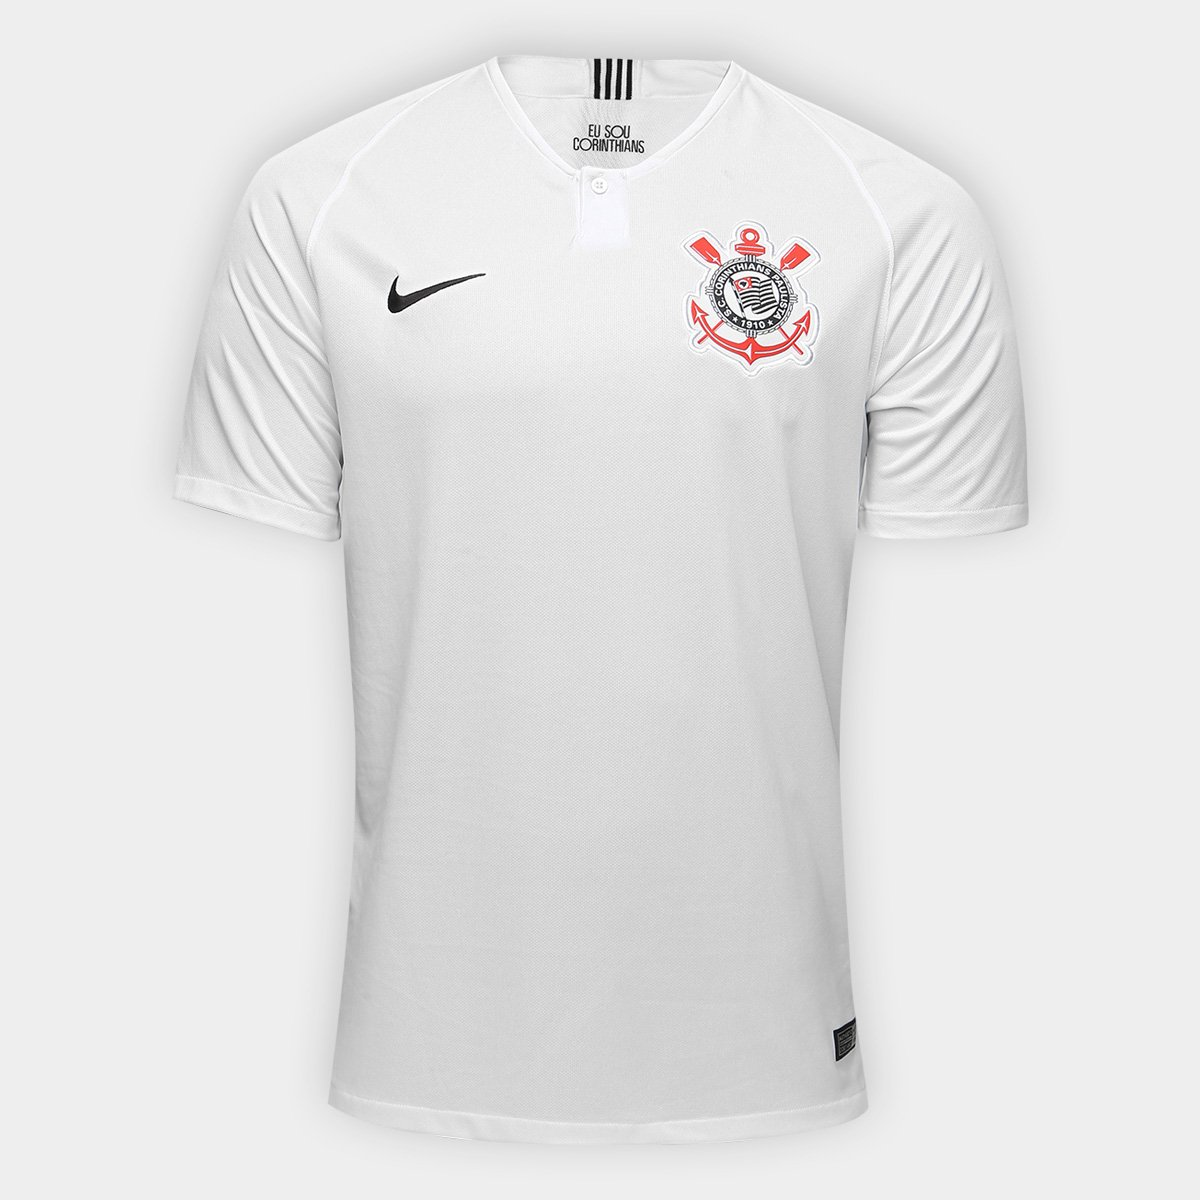 Camisa Corinthians I 18 19 s n° Torcedor Nike Masculina - Branco e ... 1a3da303e1bd5